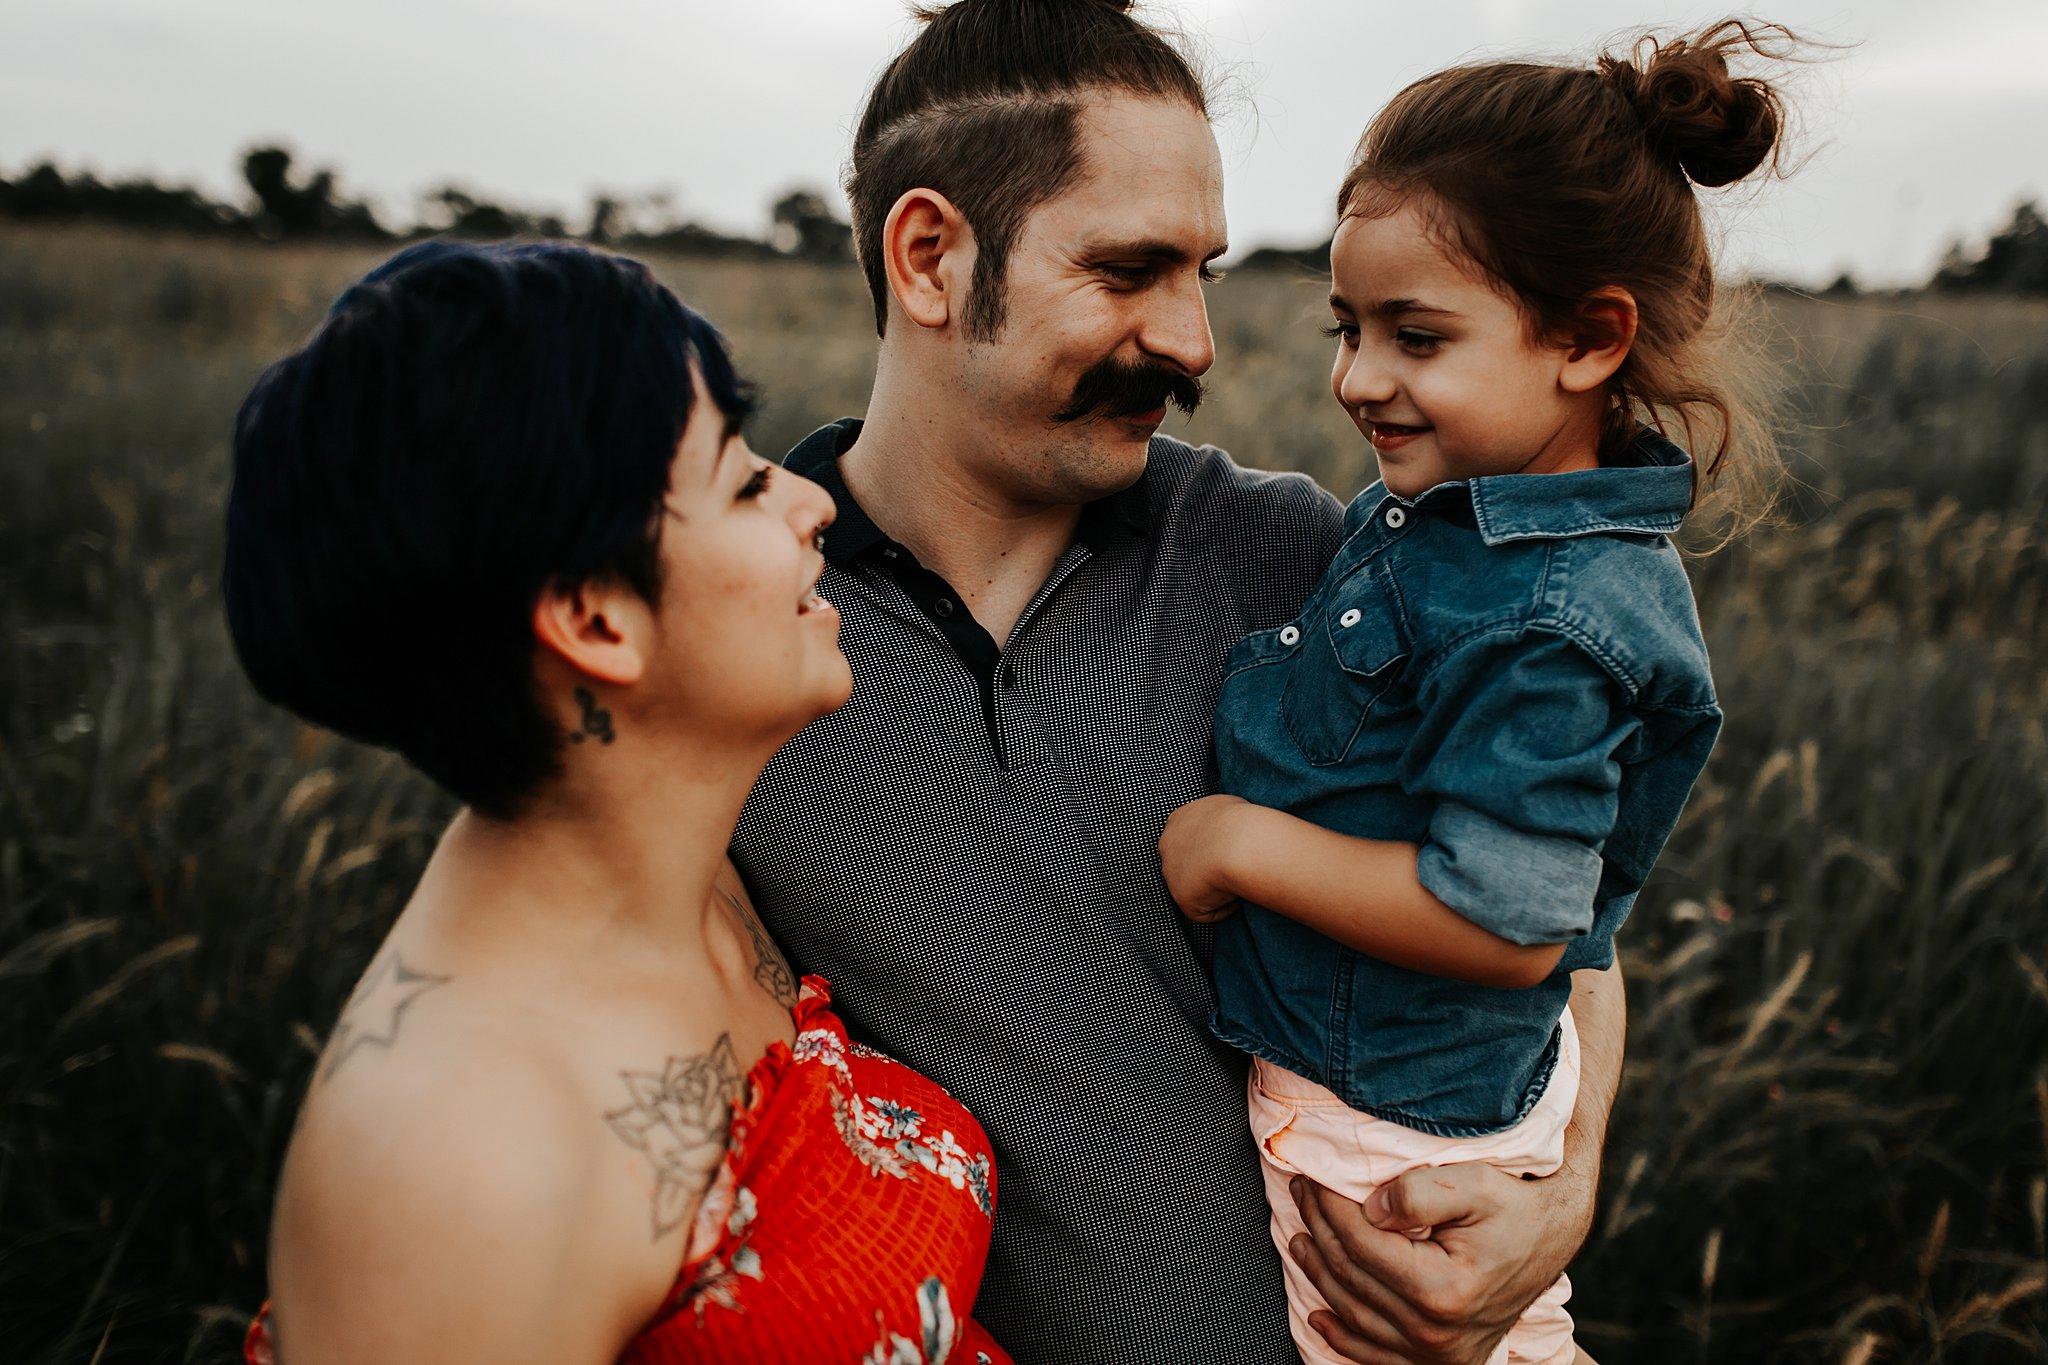 Meagan-San-Antonio-Maternity-Photographer-57_WEB.jpg